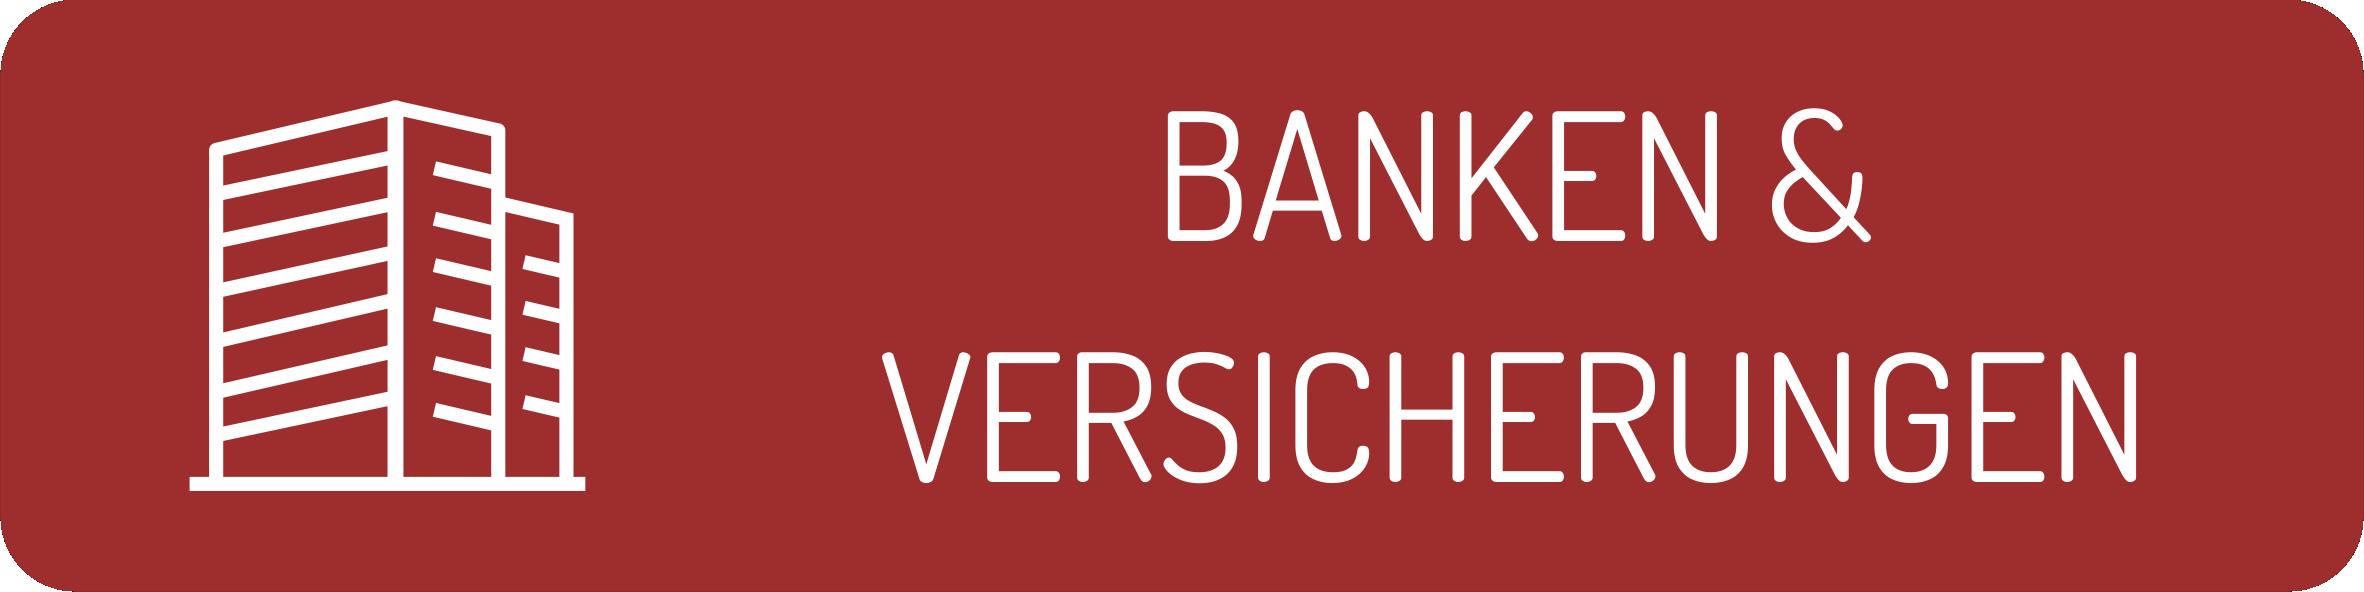 Banken - Versicherung